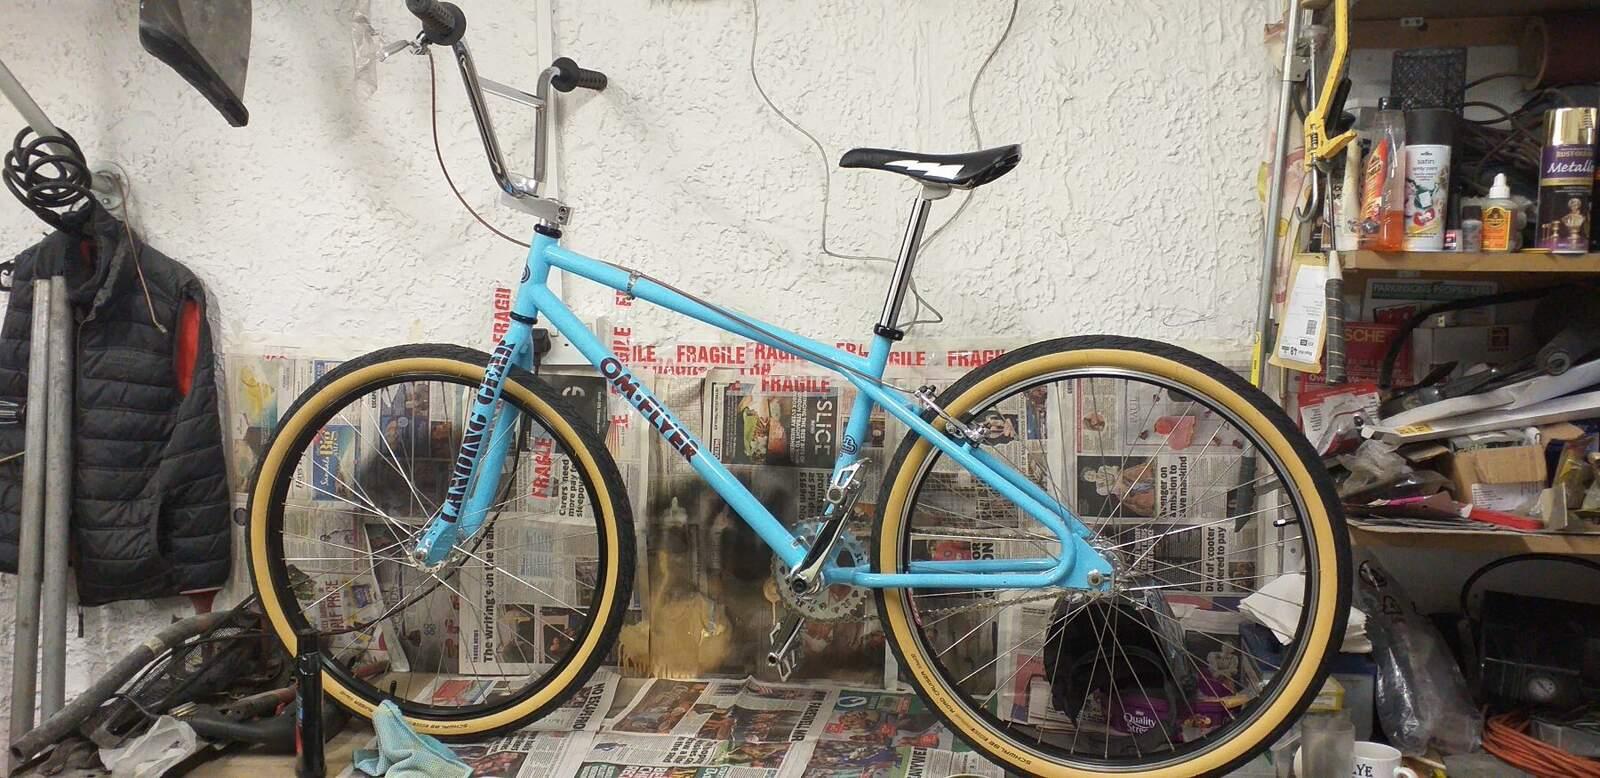 https://s3.amazonaws.com/uploads.bmxmuseum.com/user-images/84768/new-bike-tyres603f78f9ad.jpg